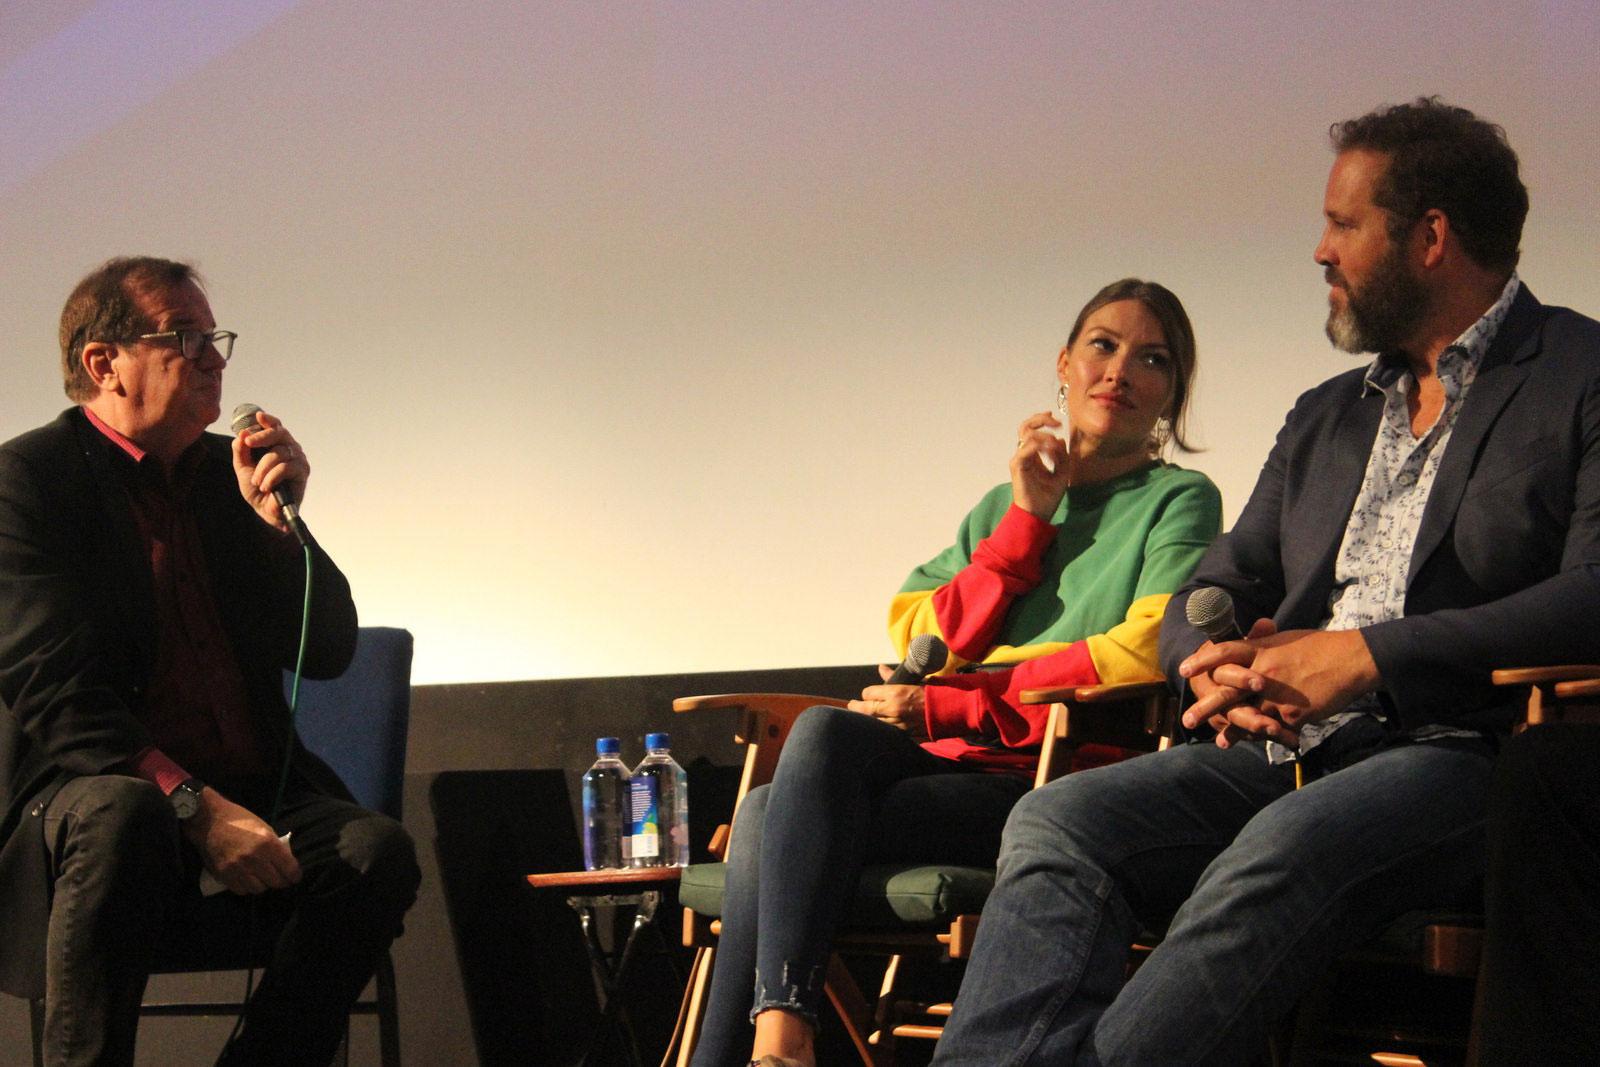 Cinema Series host Pete Hammond, Actress Kelly MacDonald and Actor David Denman